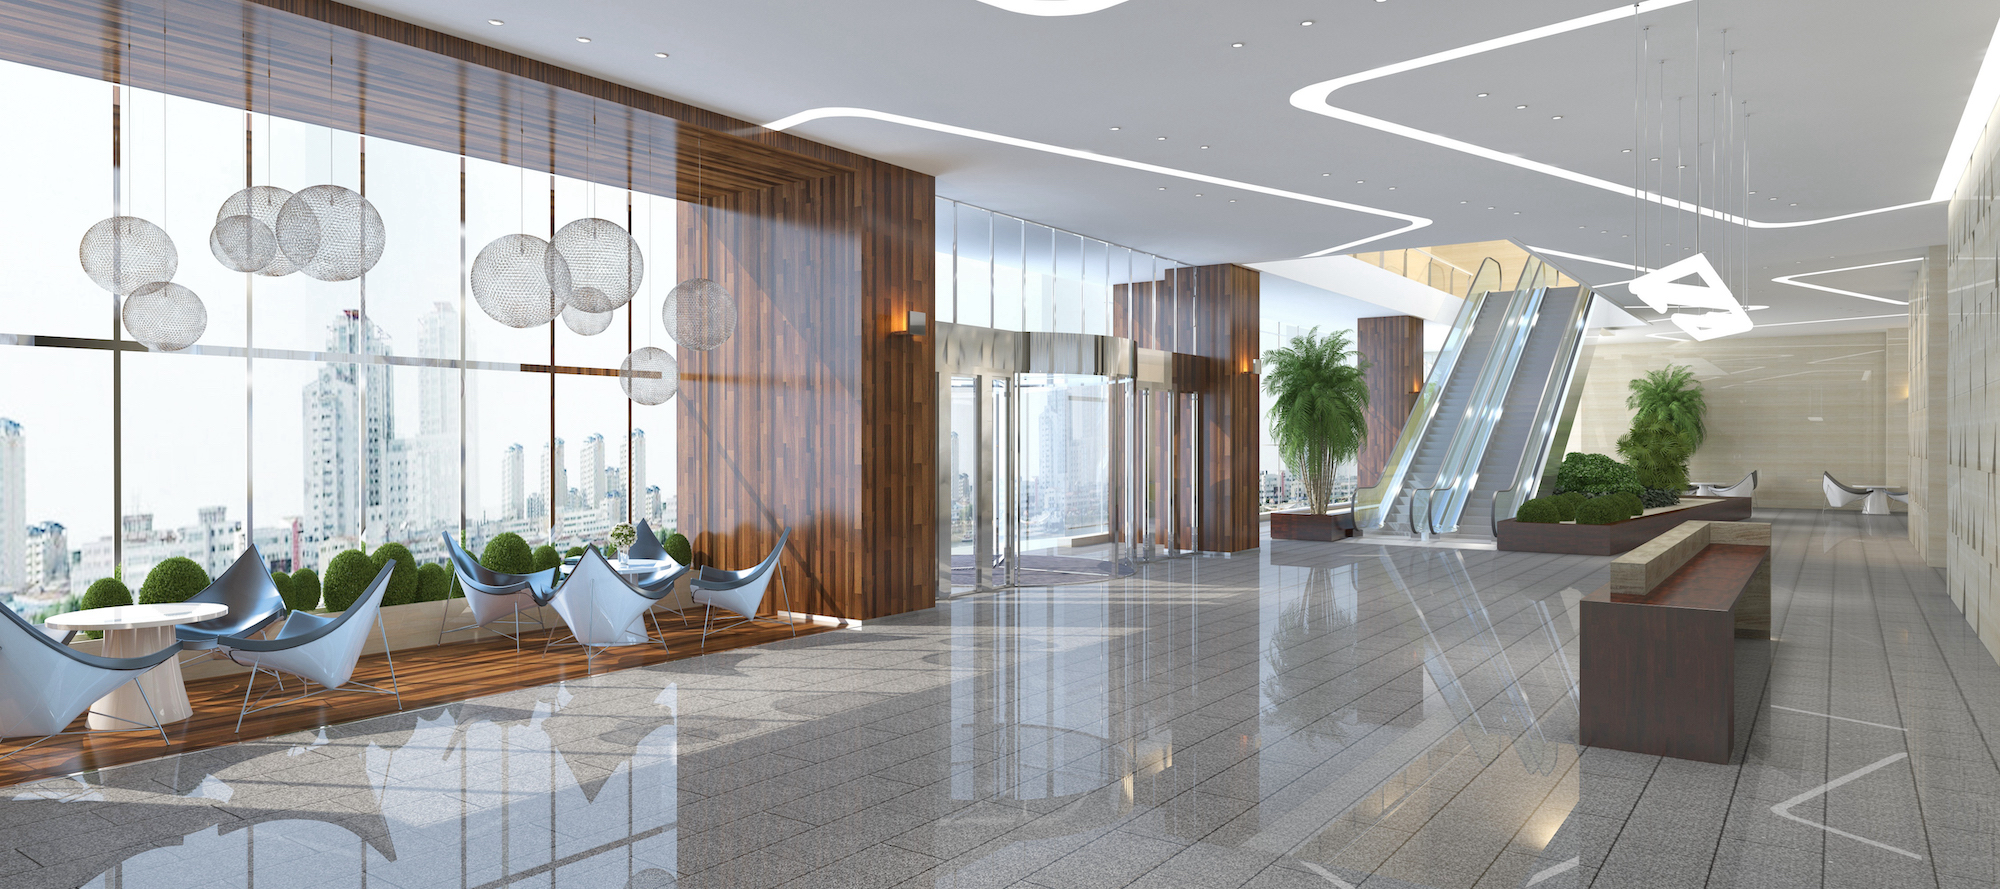 Business lobby